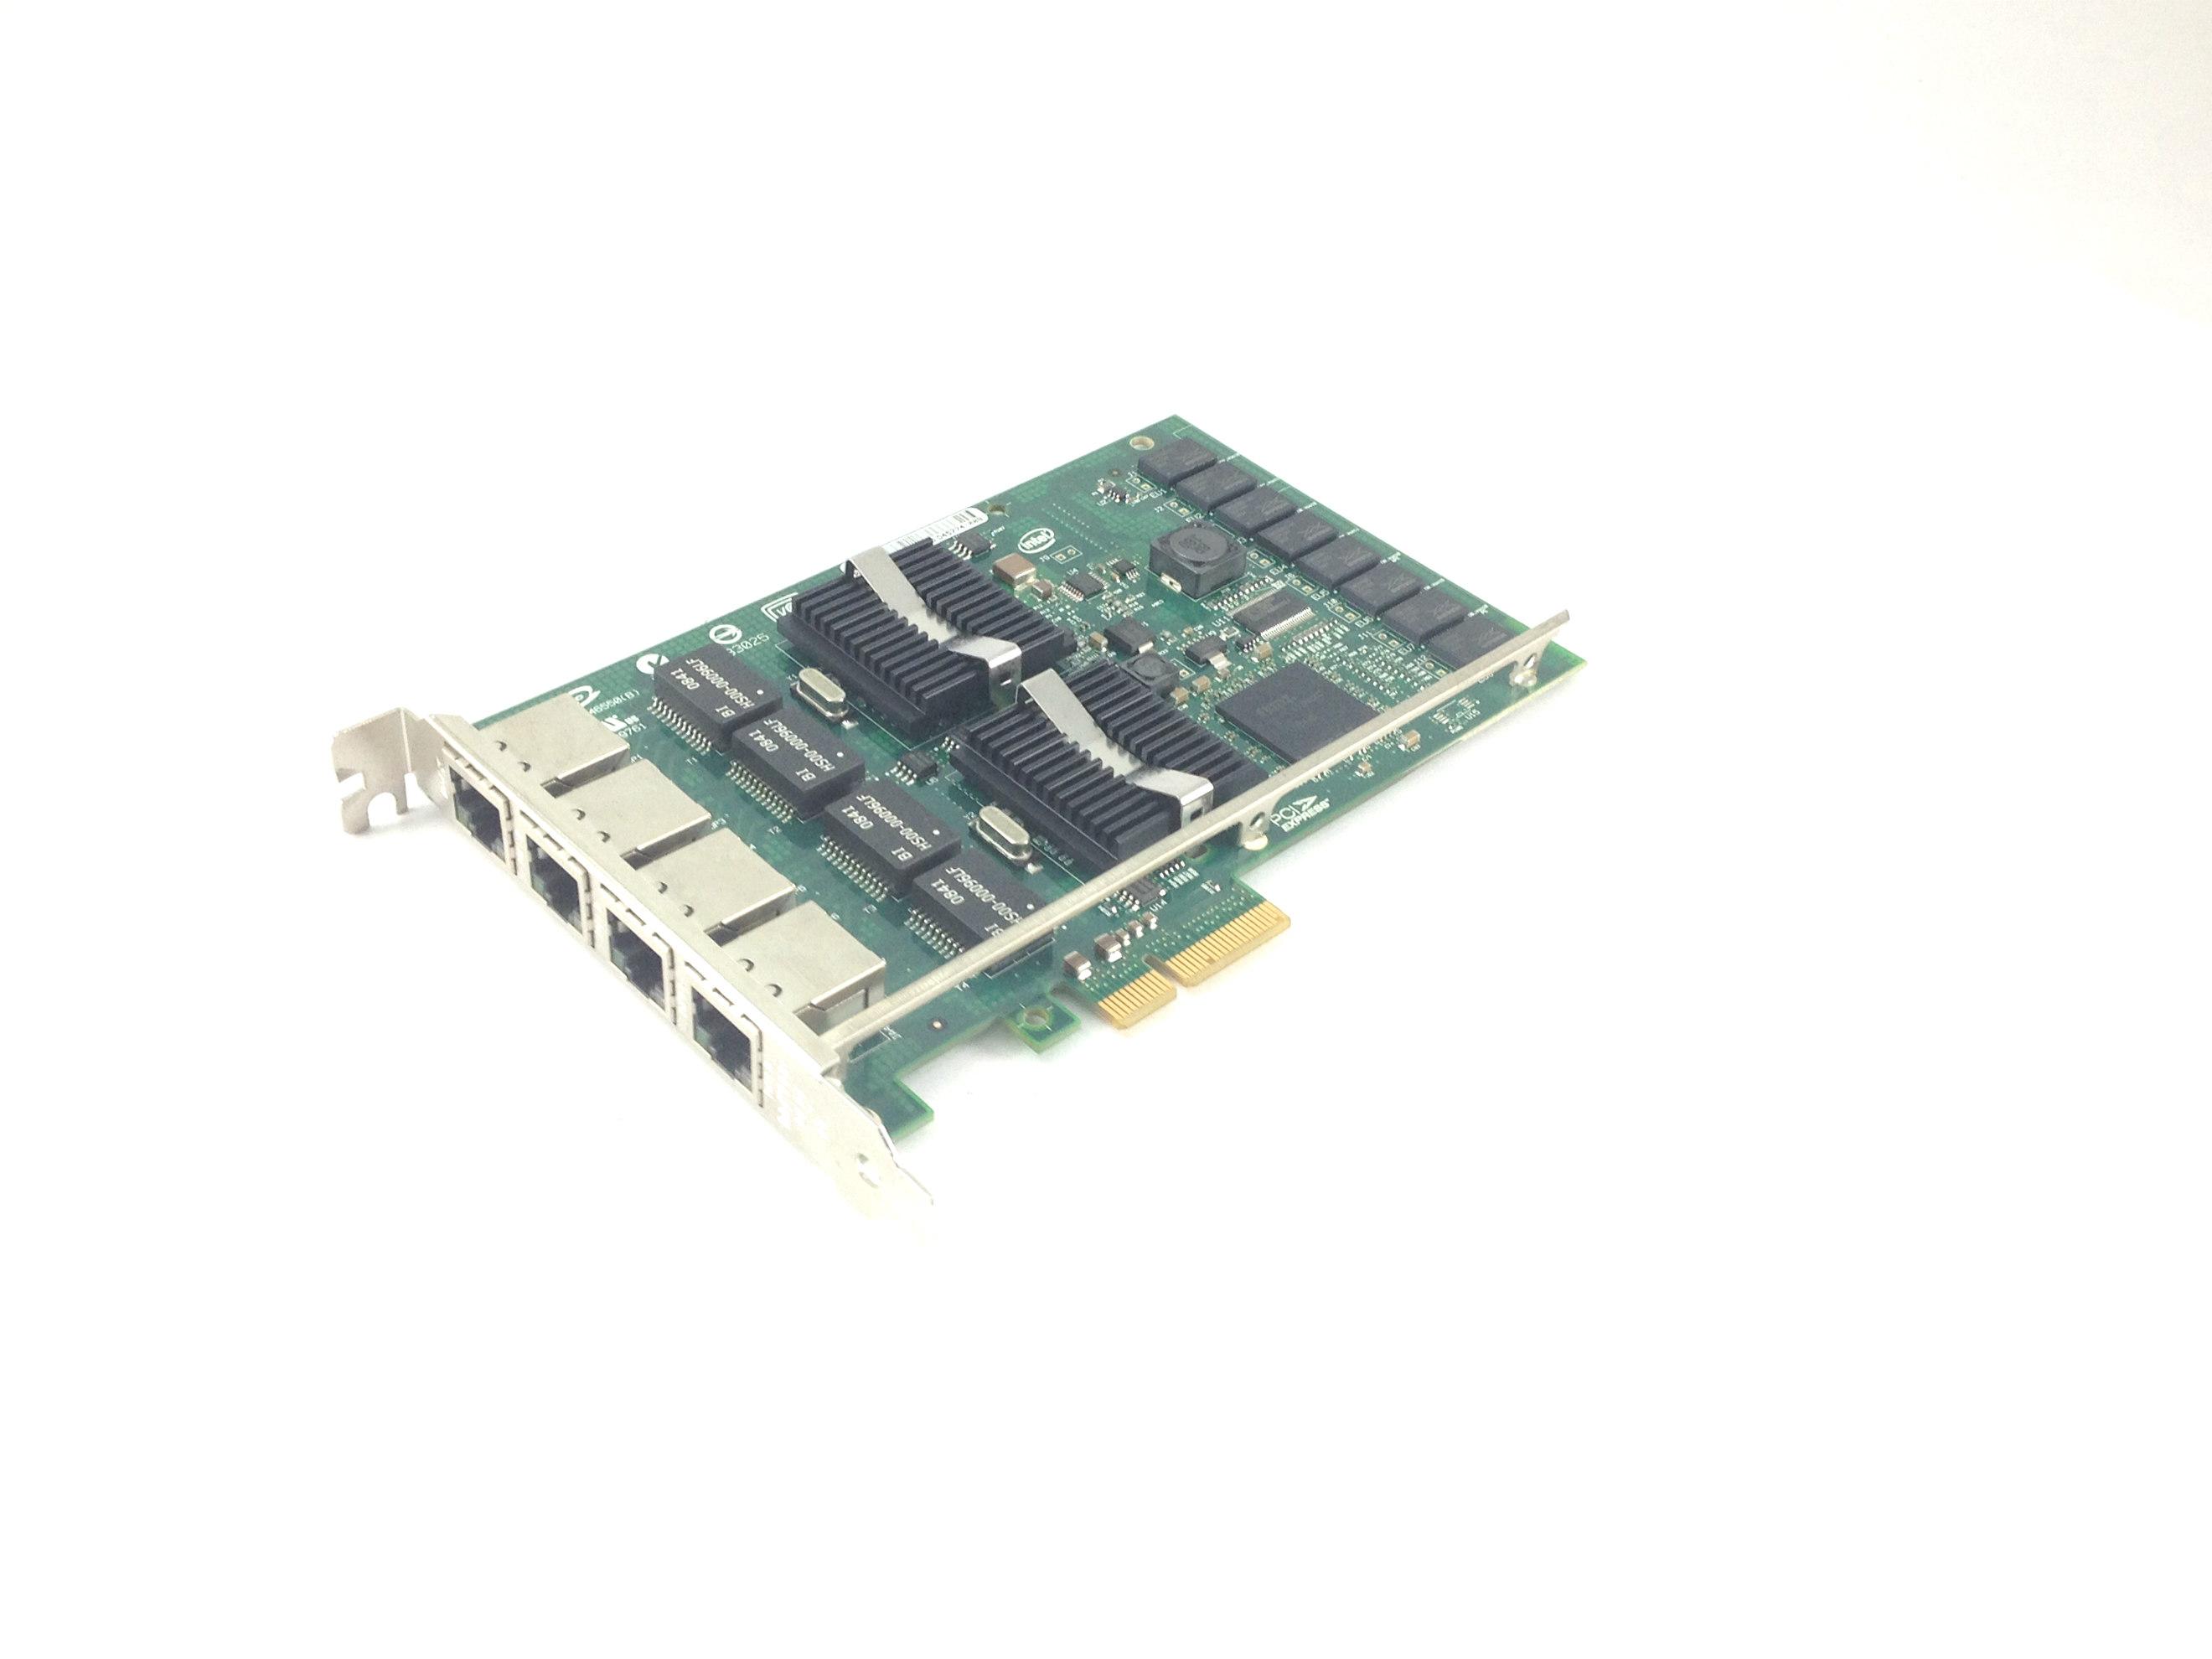 Isilon 3000X Mellanox Infinihost III Infiniband PCI-E Adapter (415-0017-07)